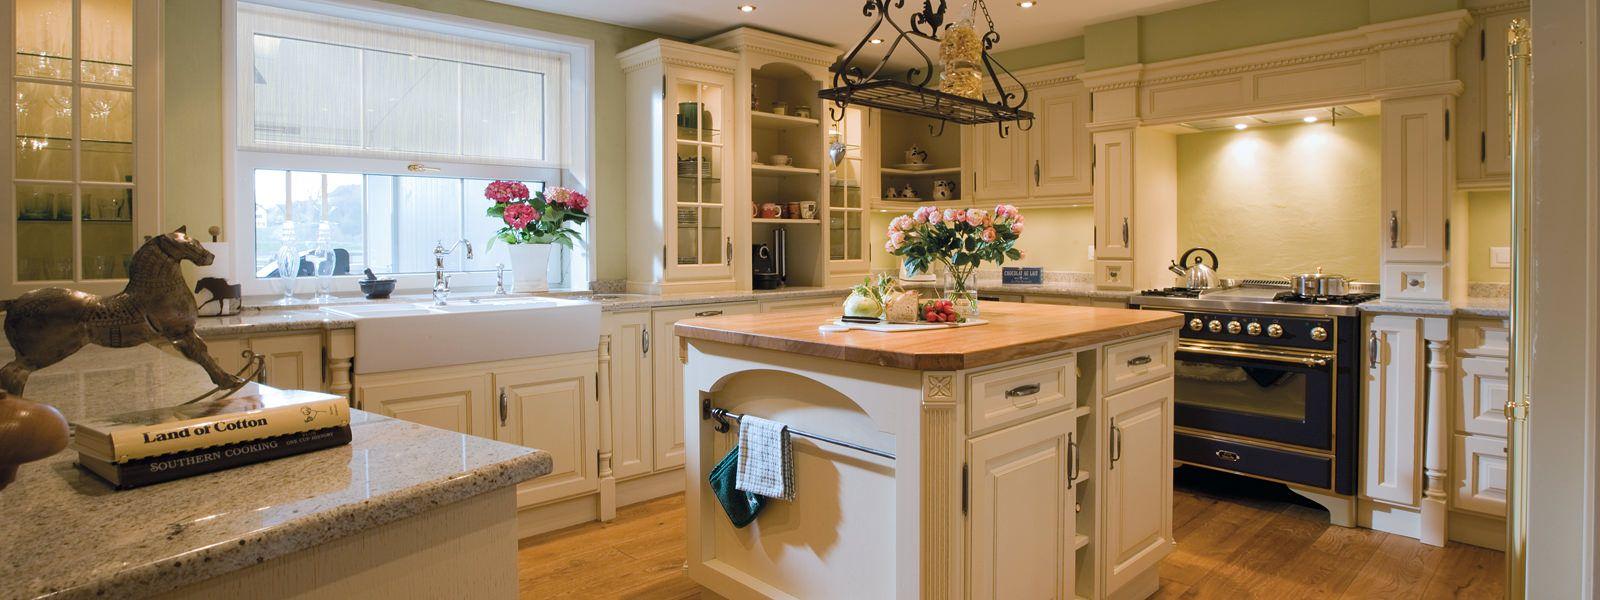 Küche Landhausstil | wohnwertig.com | Hauswünsche | Pinterest ...